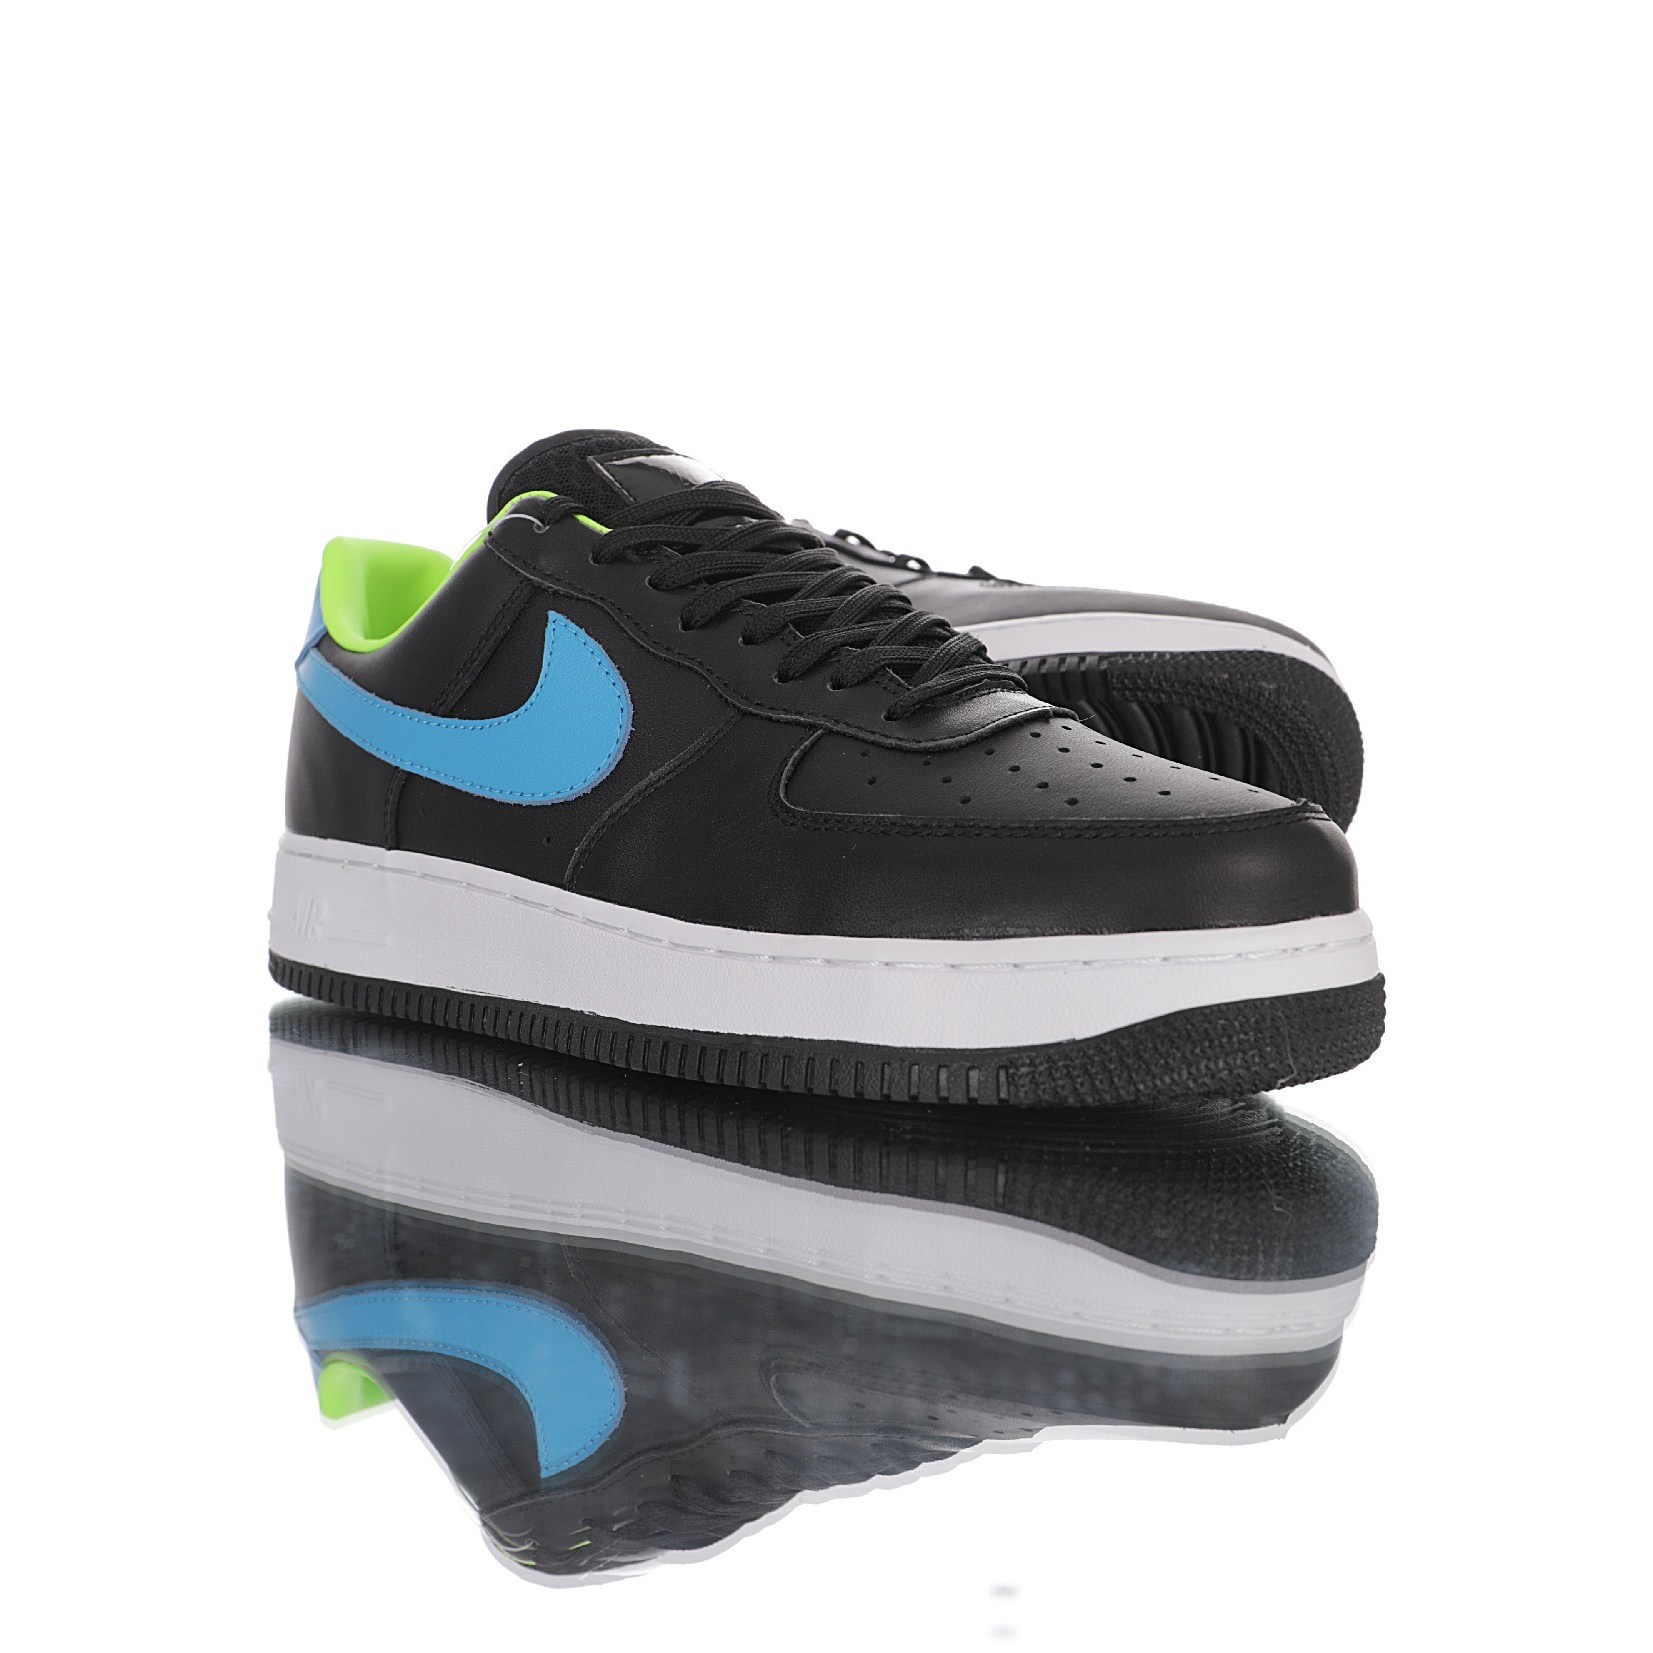 Nike Air Force 나이키 에어 포스 1 07 Low PremiumBlackBlueGreen 315122 - 111 남성운동화 블루그린 + 양말 증정